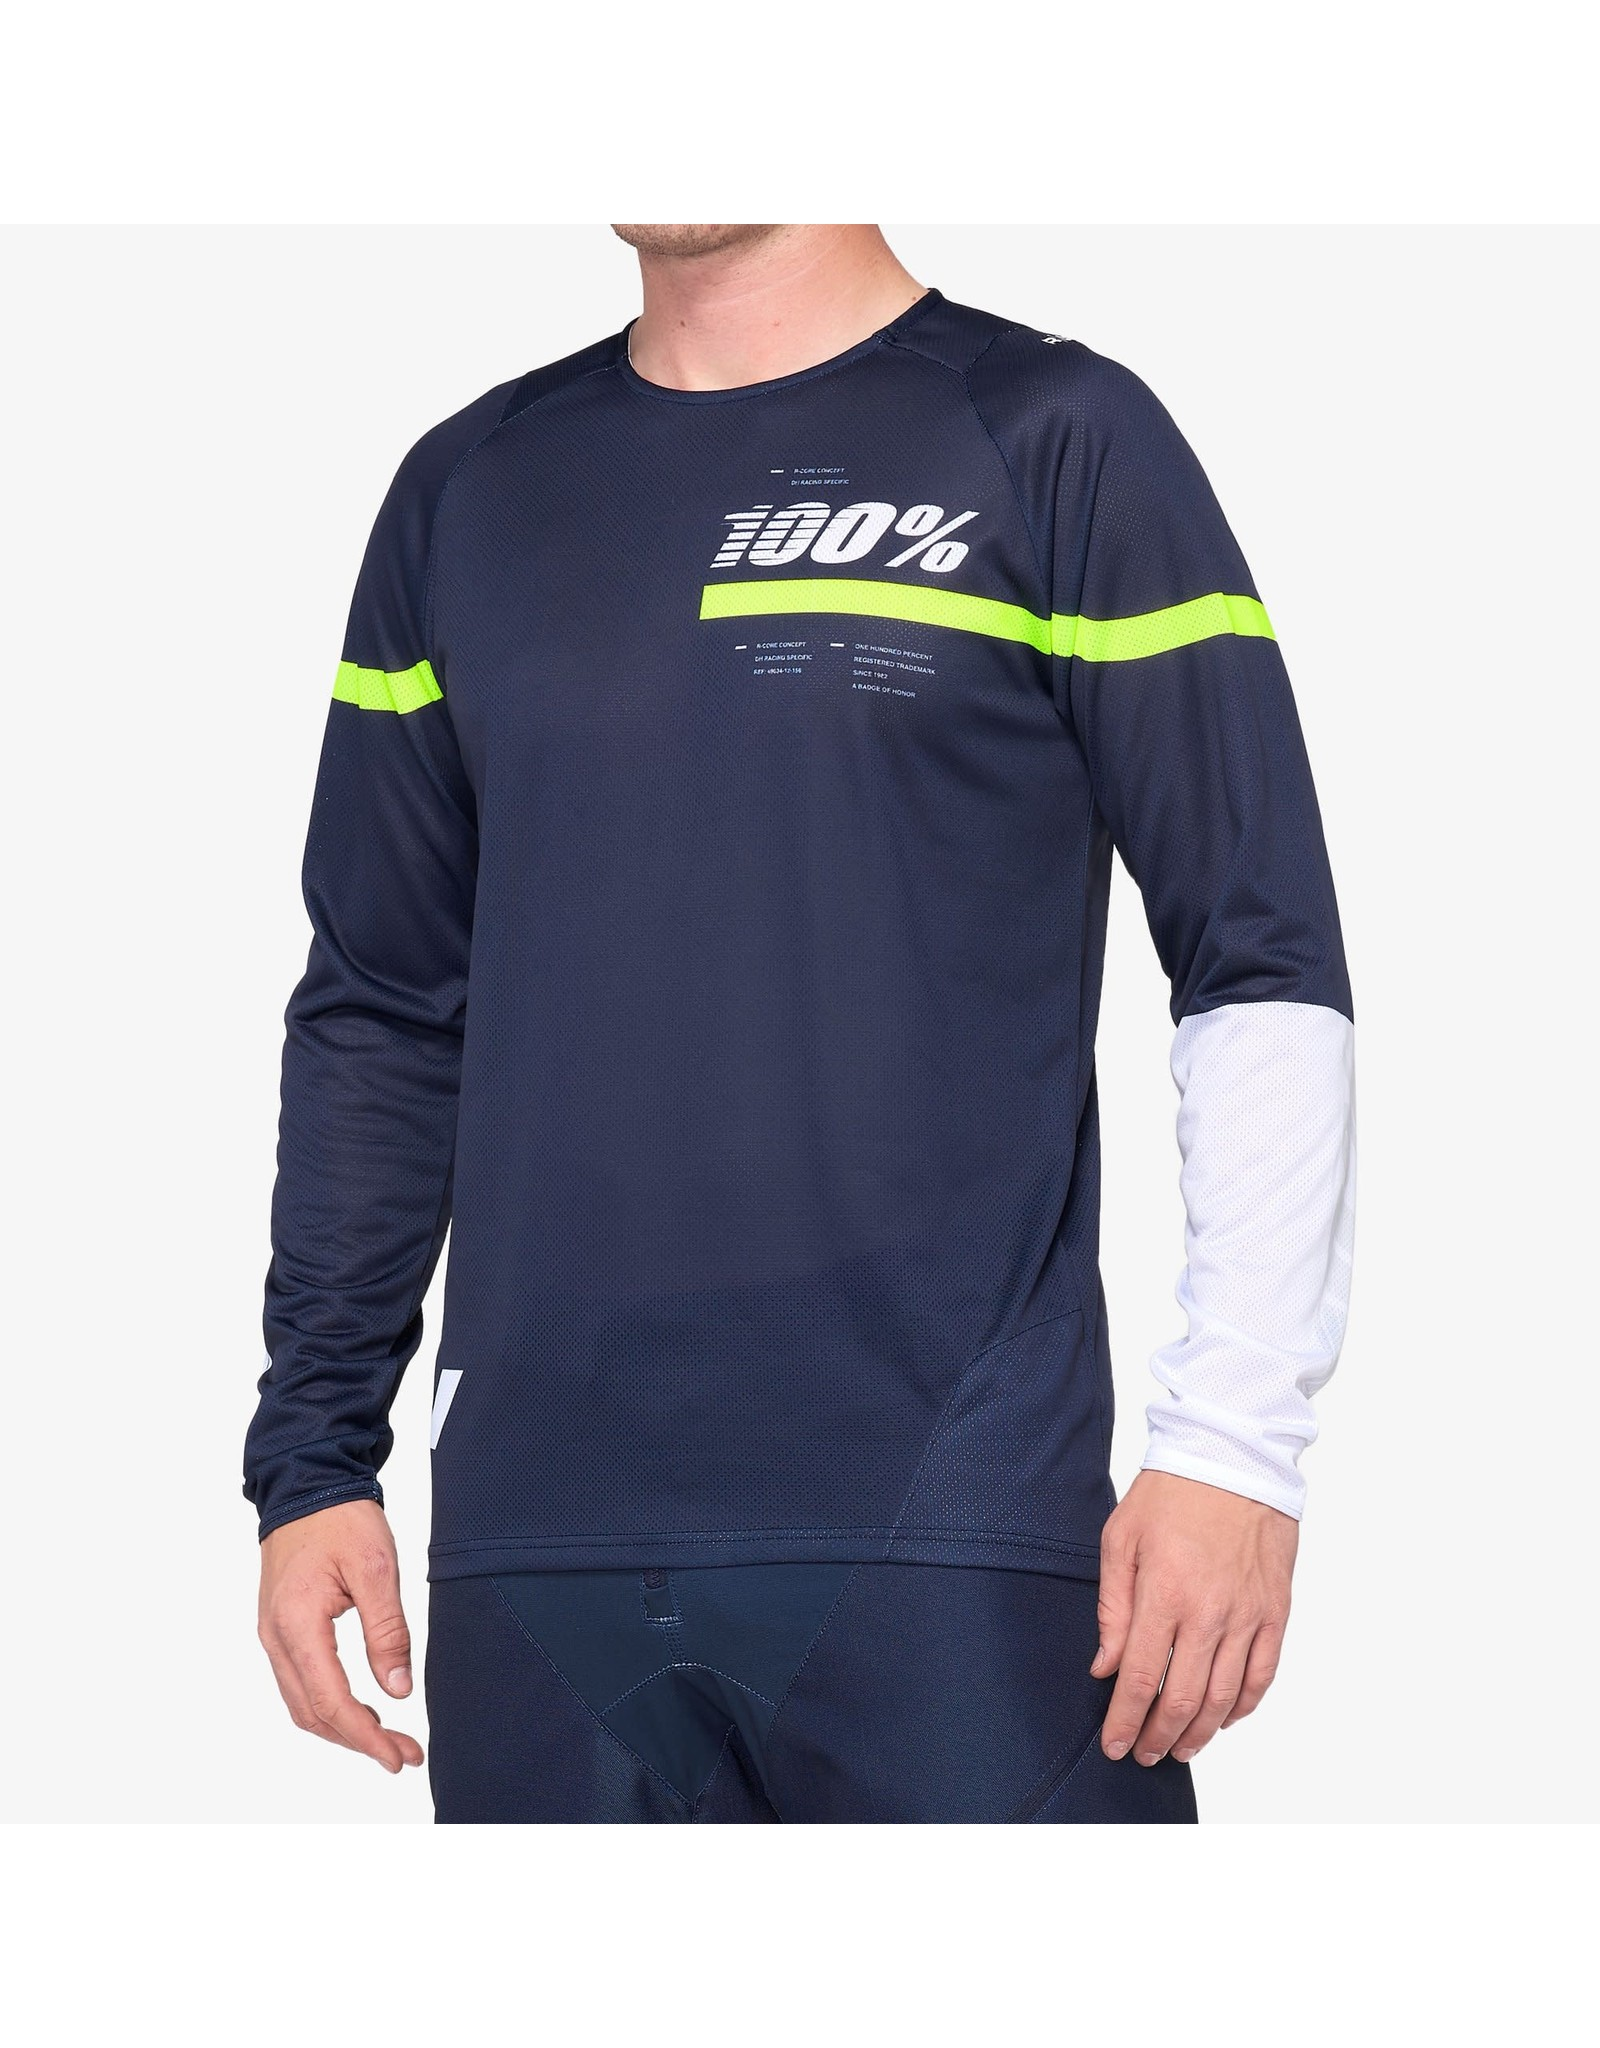 100% 100% - Men's R-CORE Jersey Dark Blue/Yellow - XL